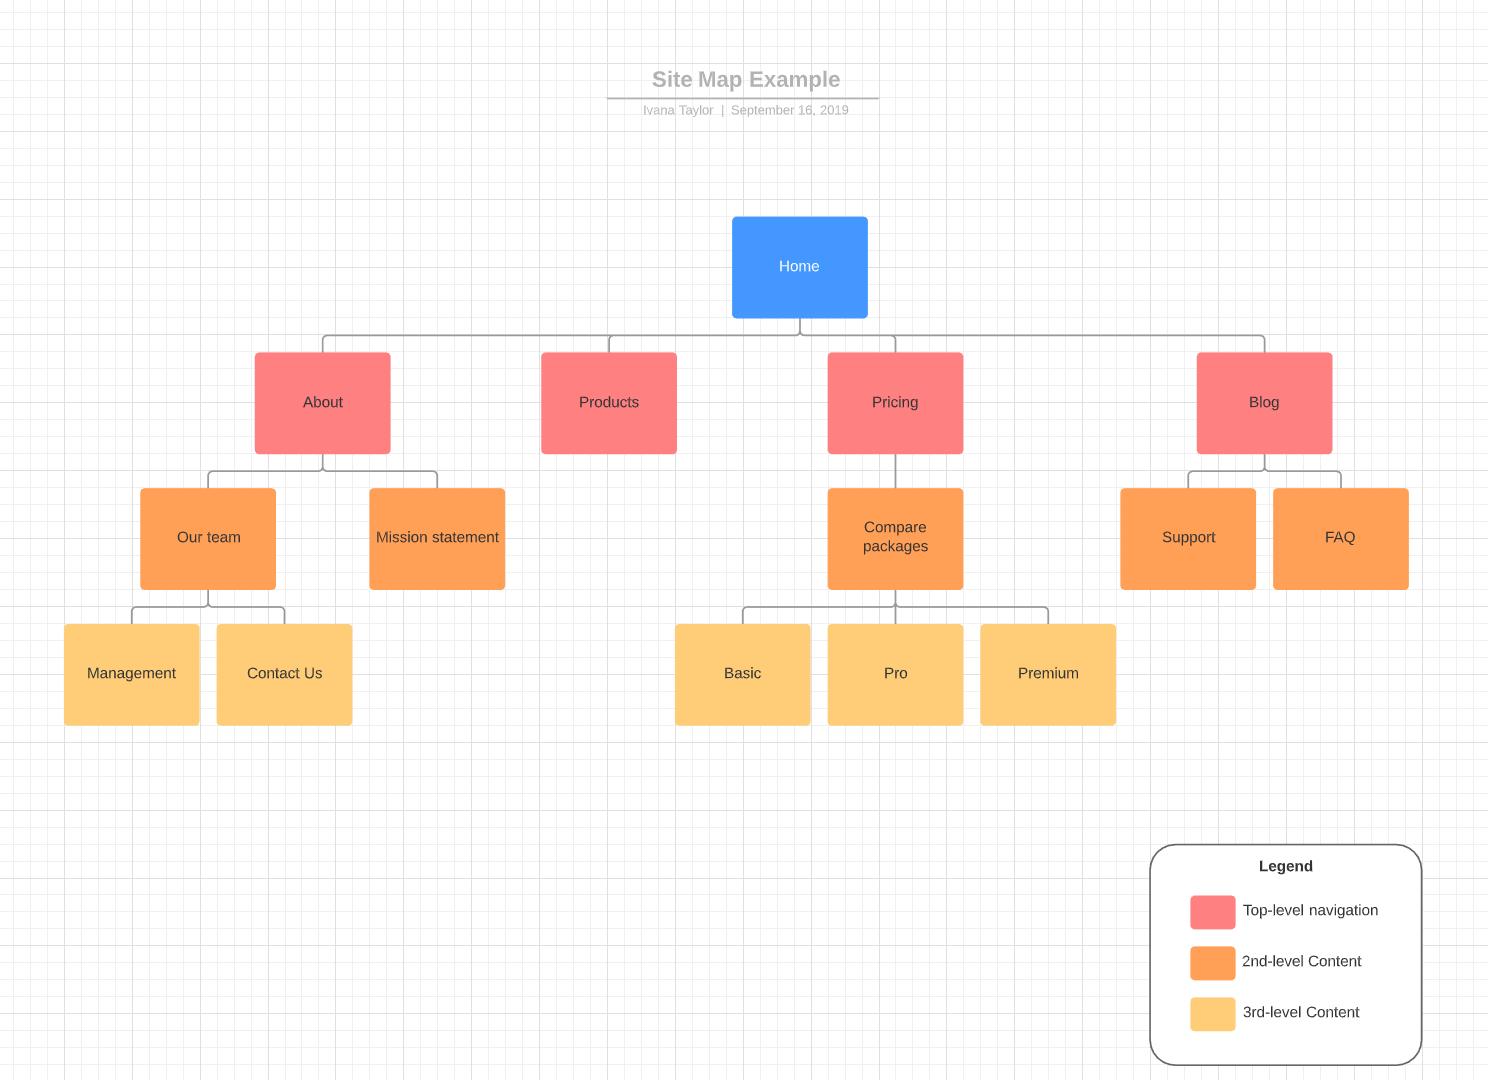 Free LucidChart tool screenshot shows a sample visual site map.